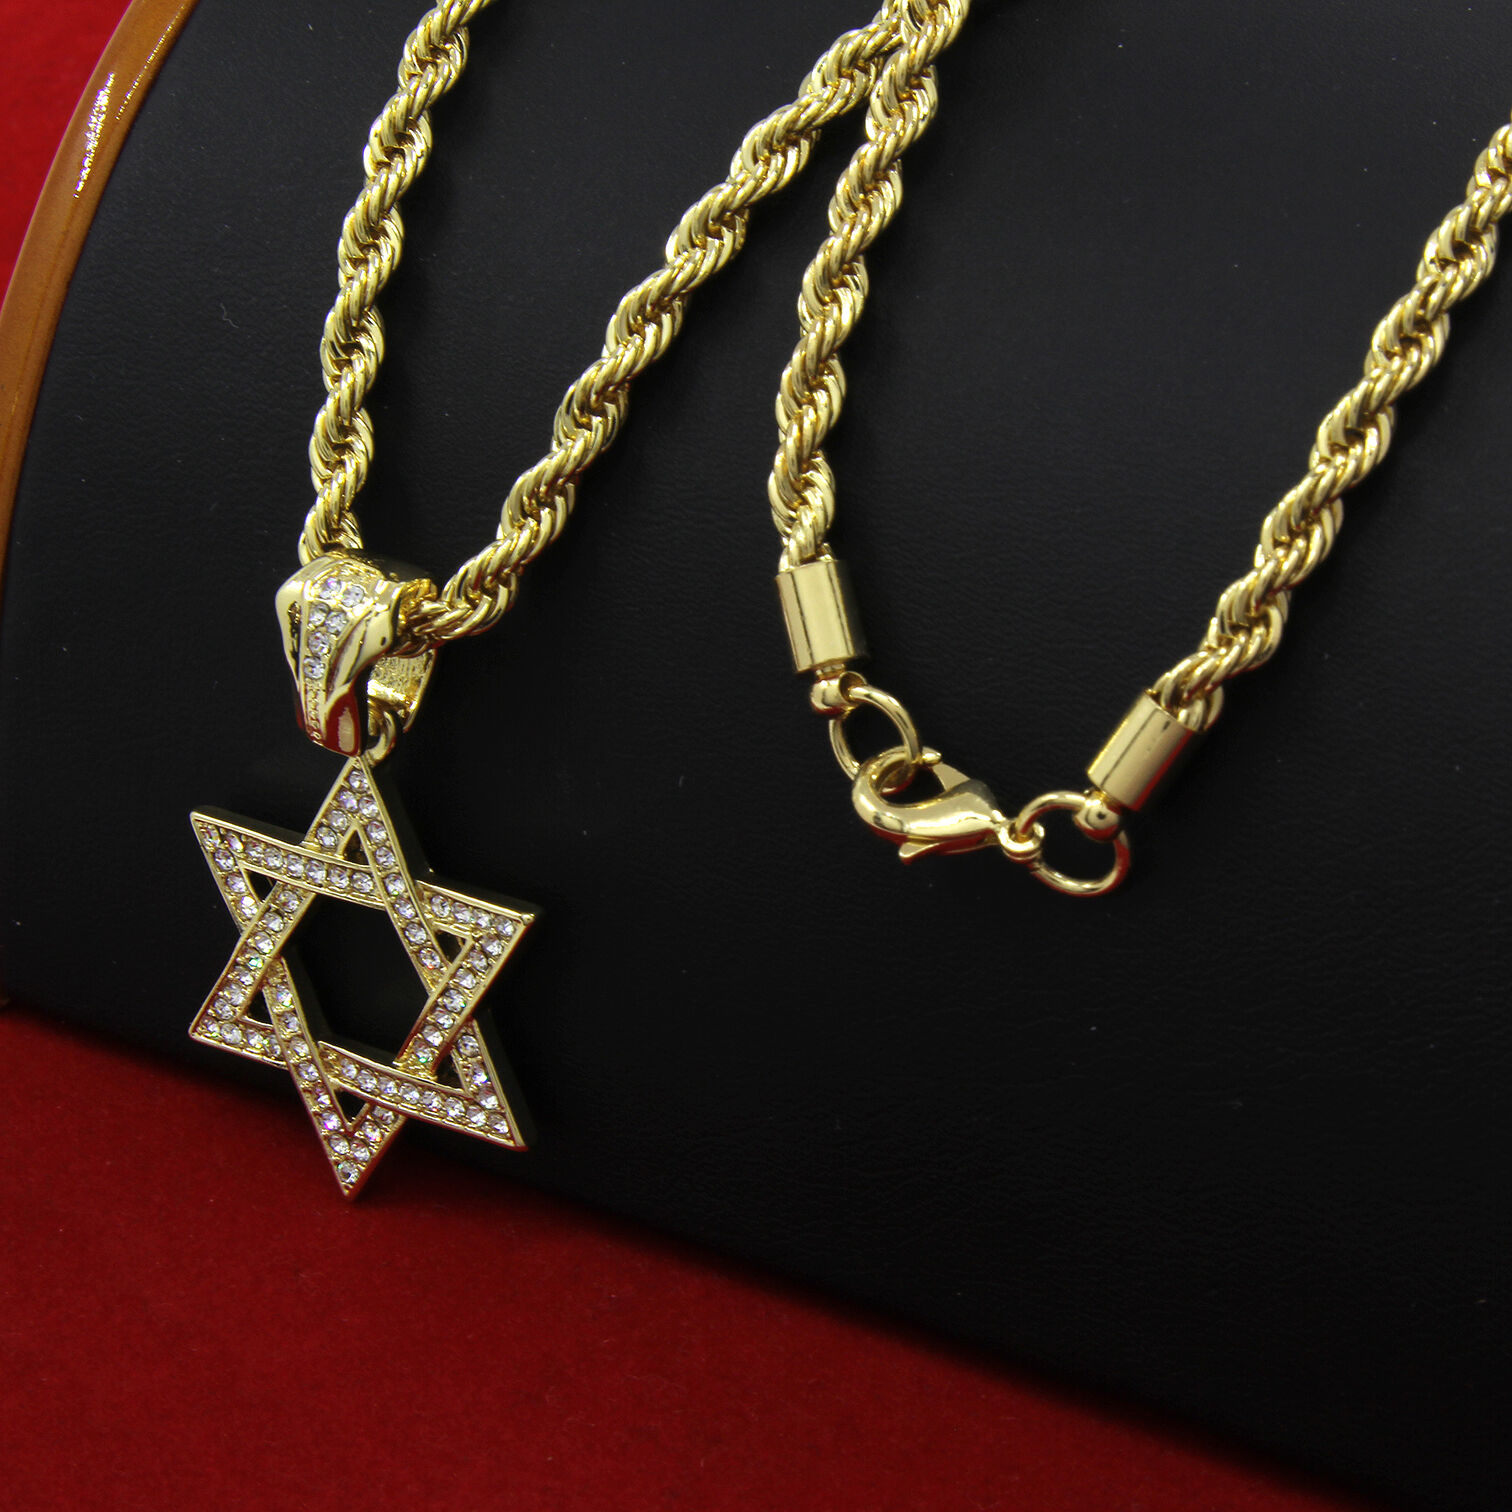 Gold Star of David: Jewelry & Watches | eBay